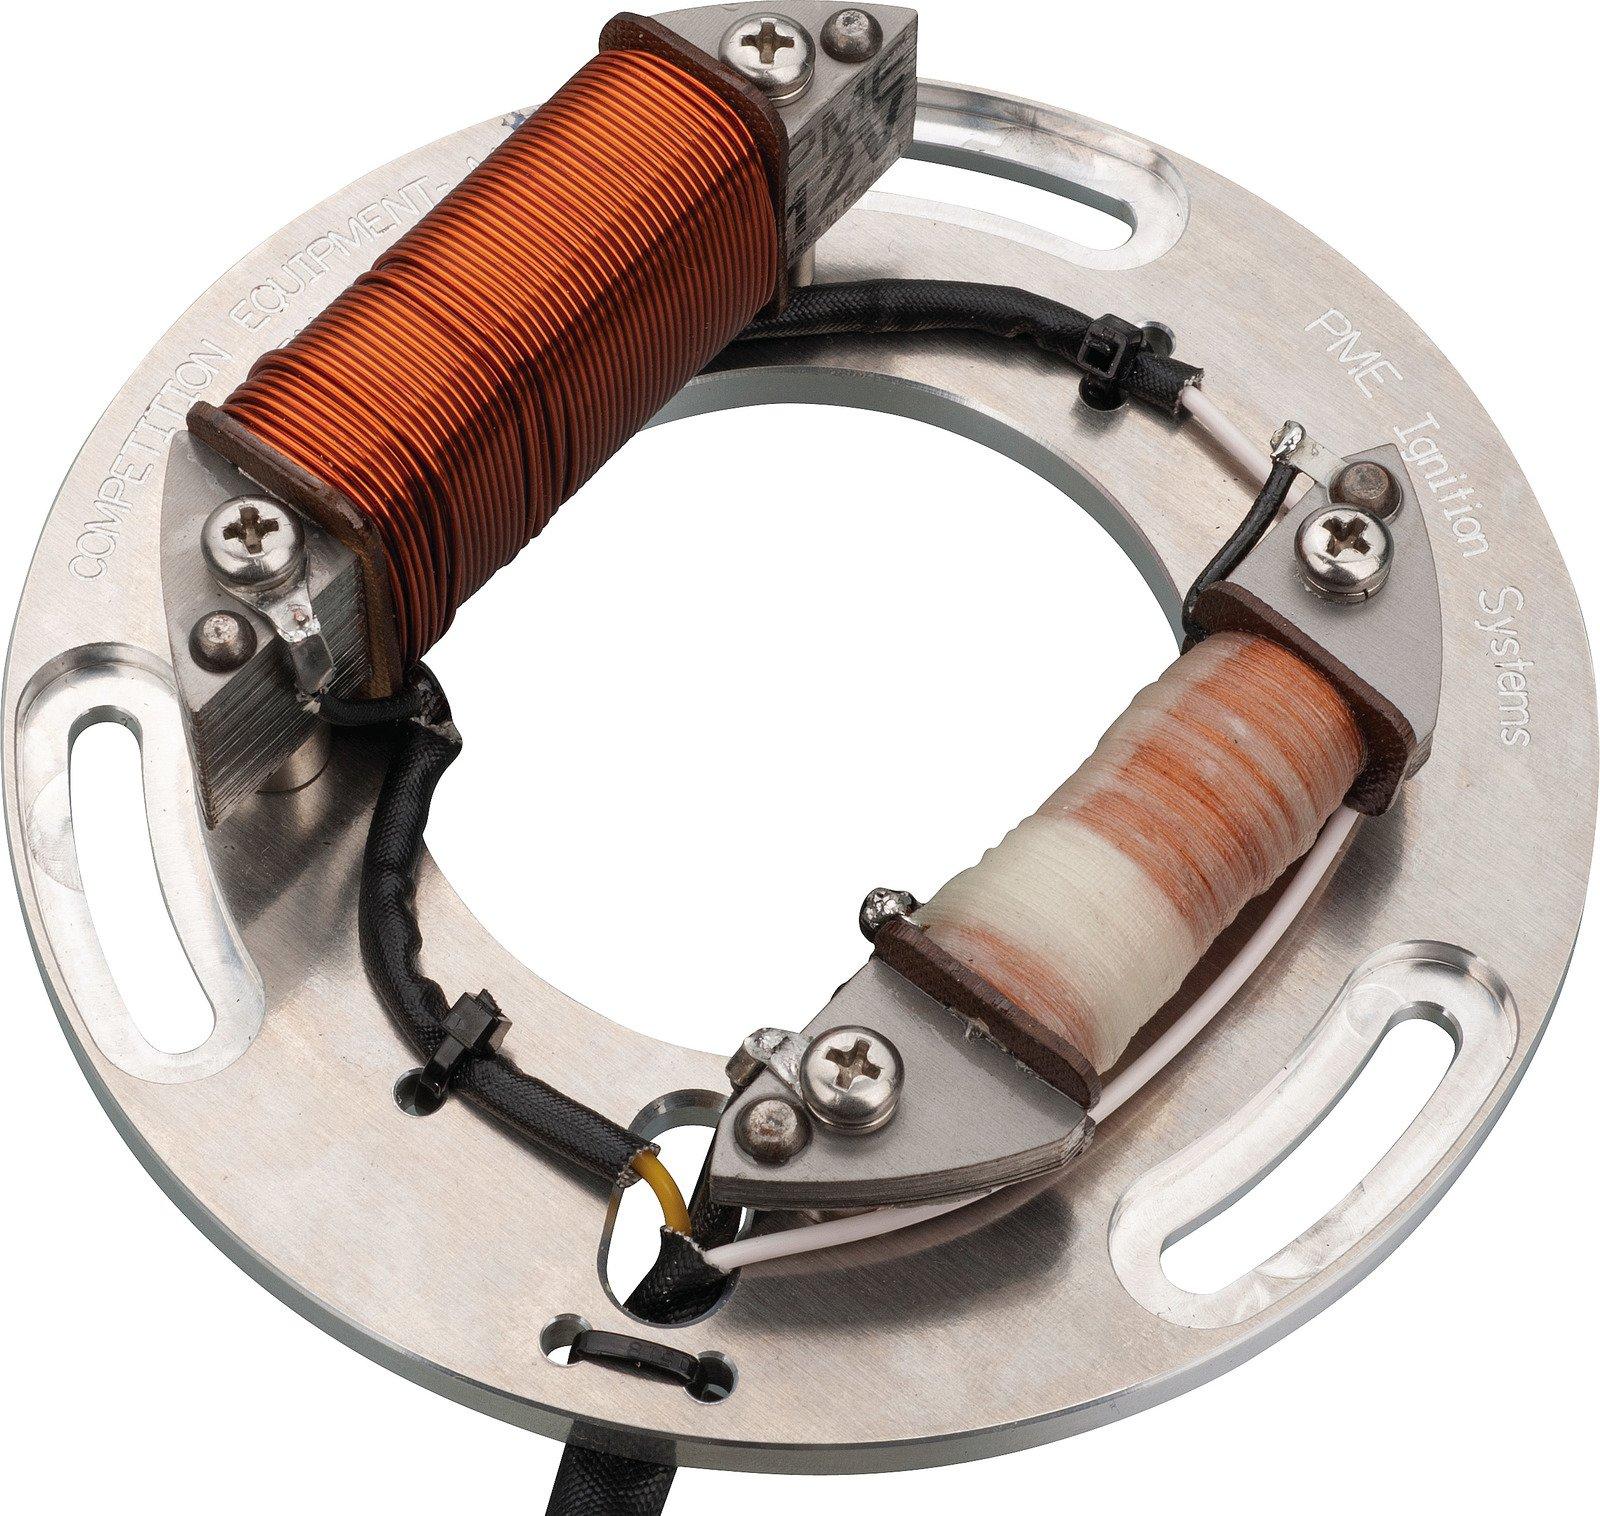 12V CDI-Ignition Conversion For XT500 TT500 50555